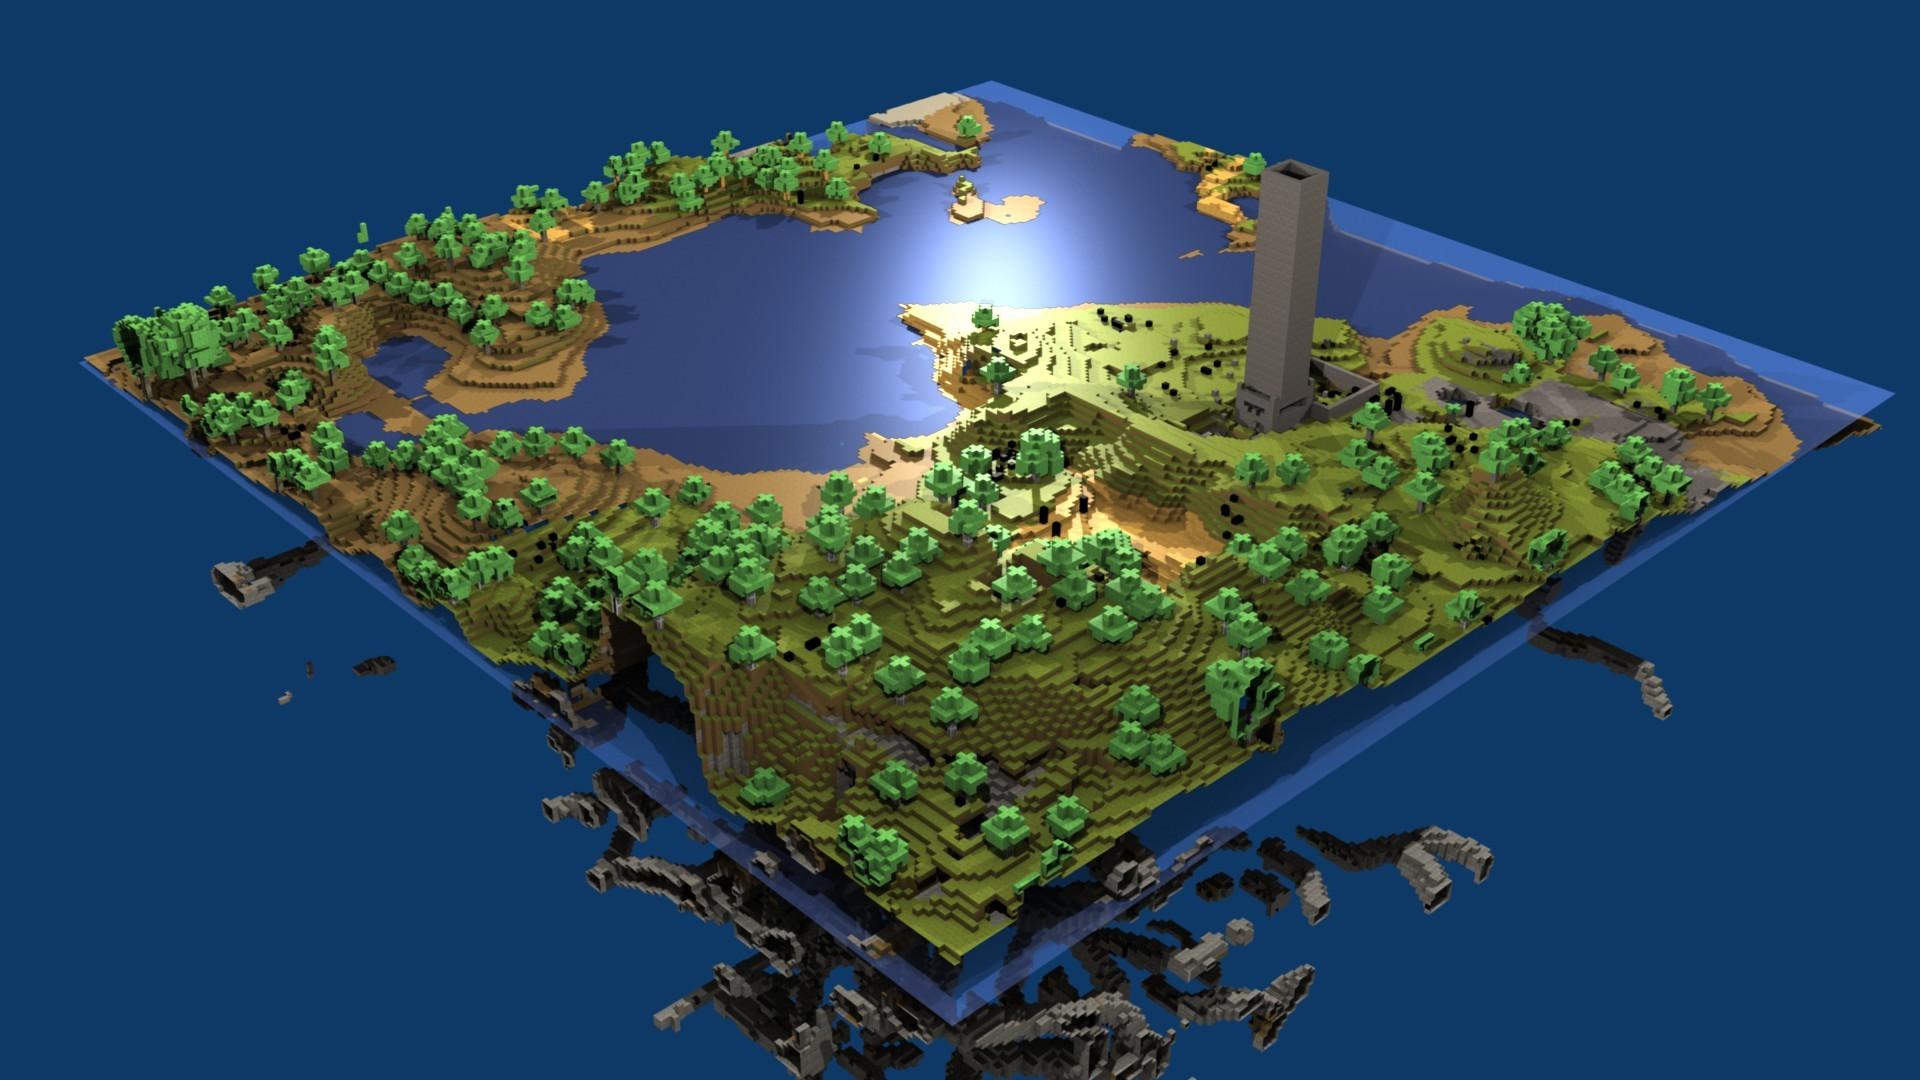 Minecraft Jeu Video Pc Fond Ecran Fond Ecran Hd